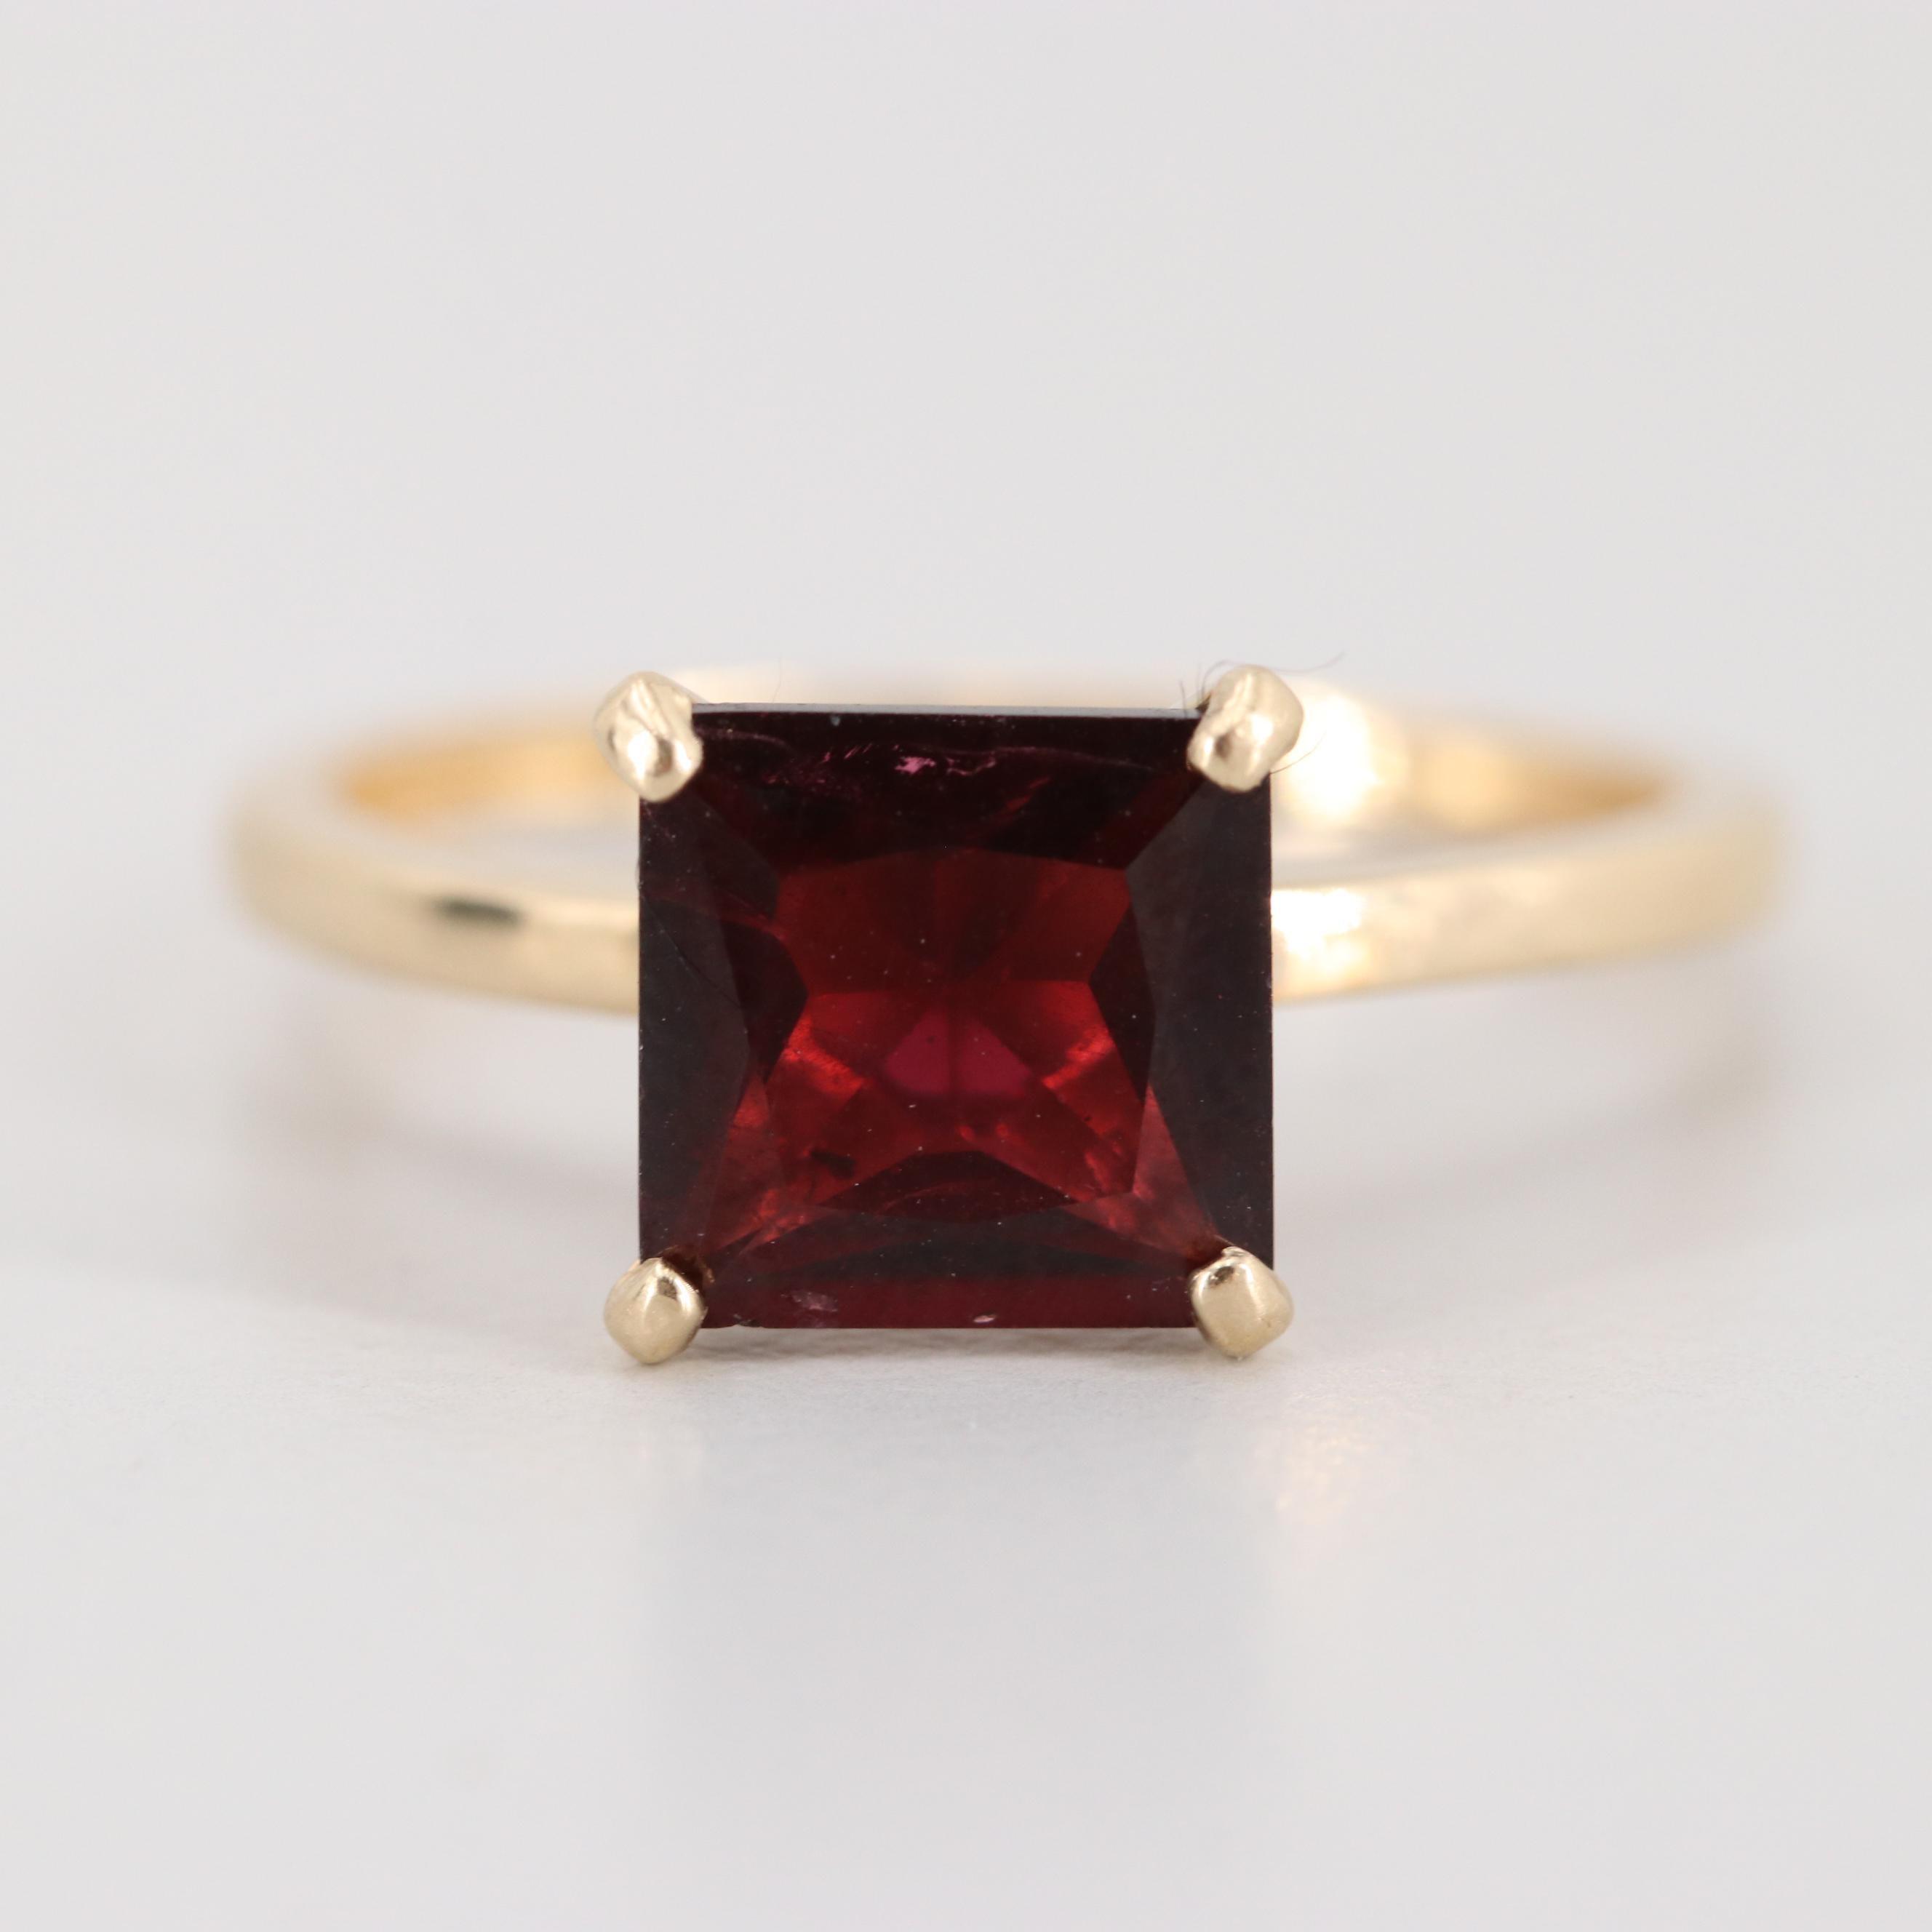 10K Yellow Gold Garnet Solitaire Ring